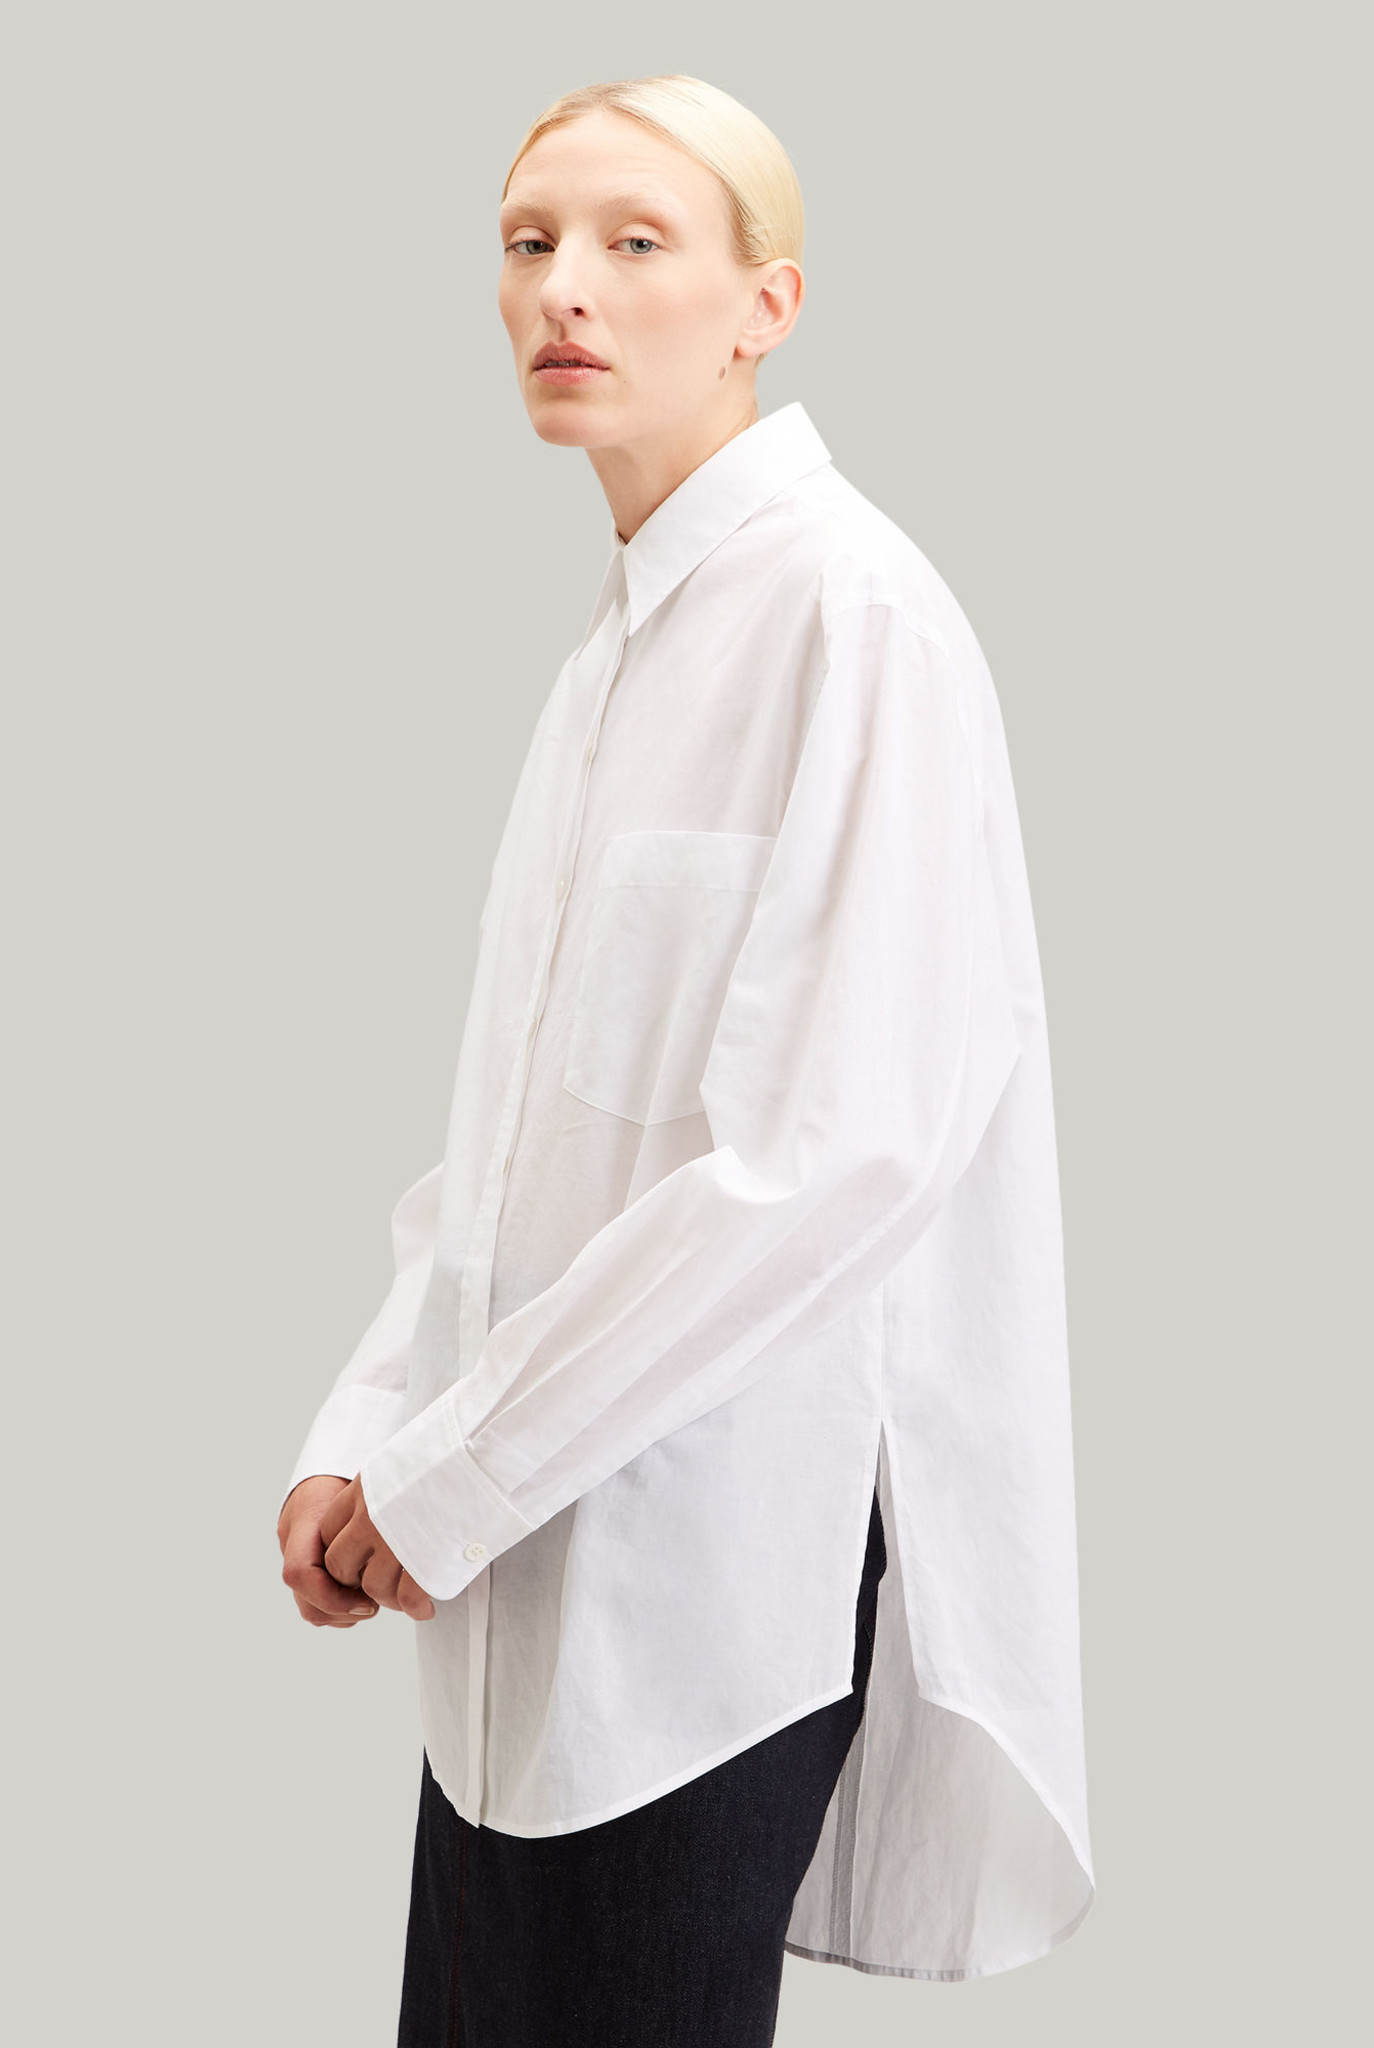 Gibson blouse white poplin